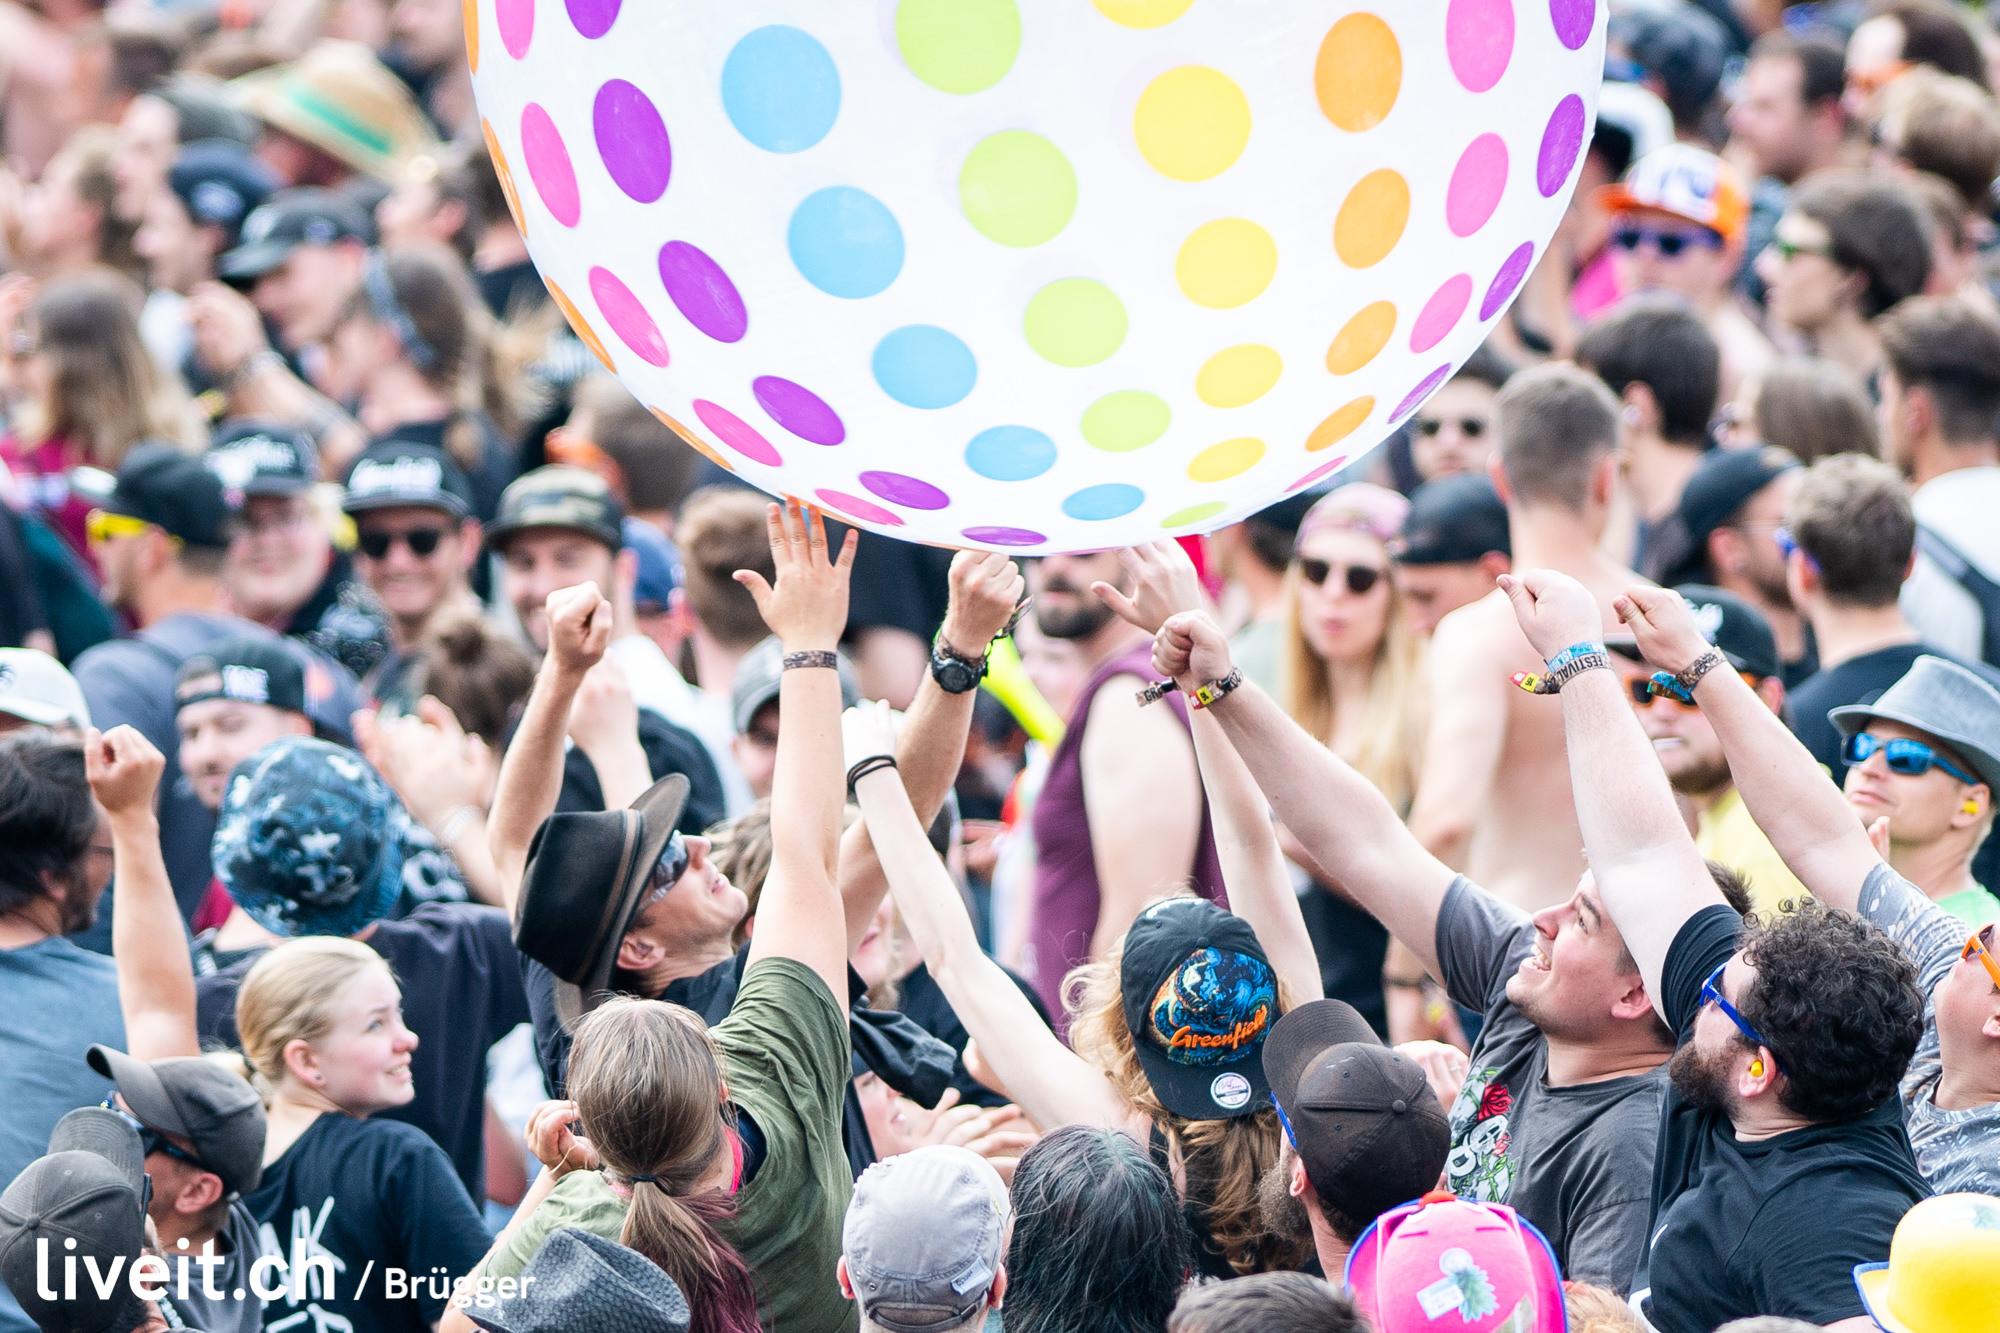 SCHWEIZ GREENFIELD FESTIVAL 2019 Zebrahead